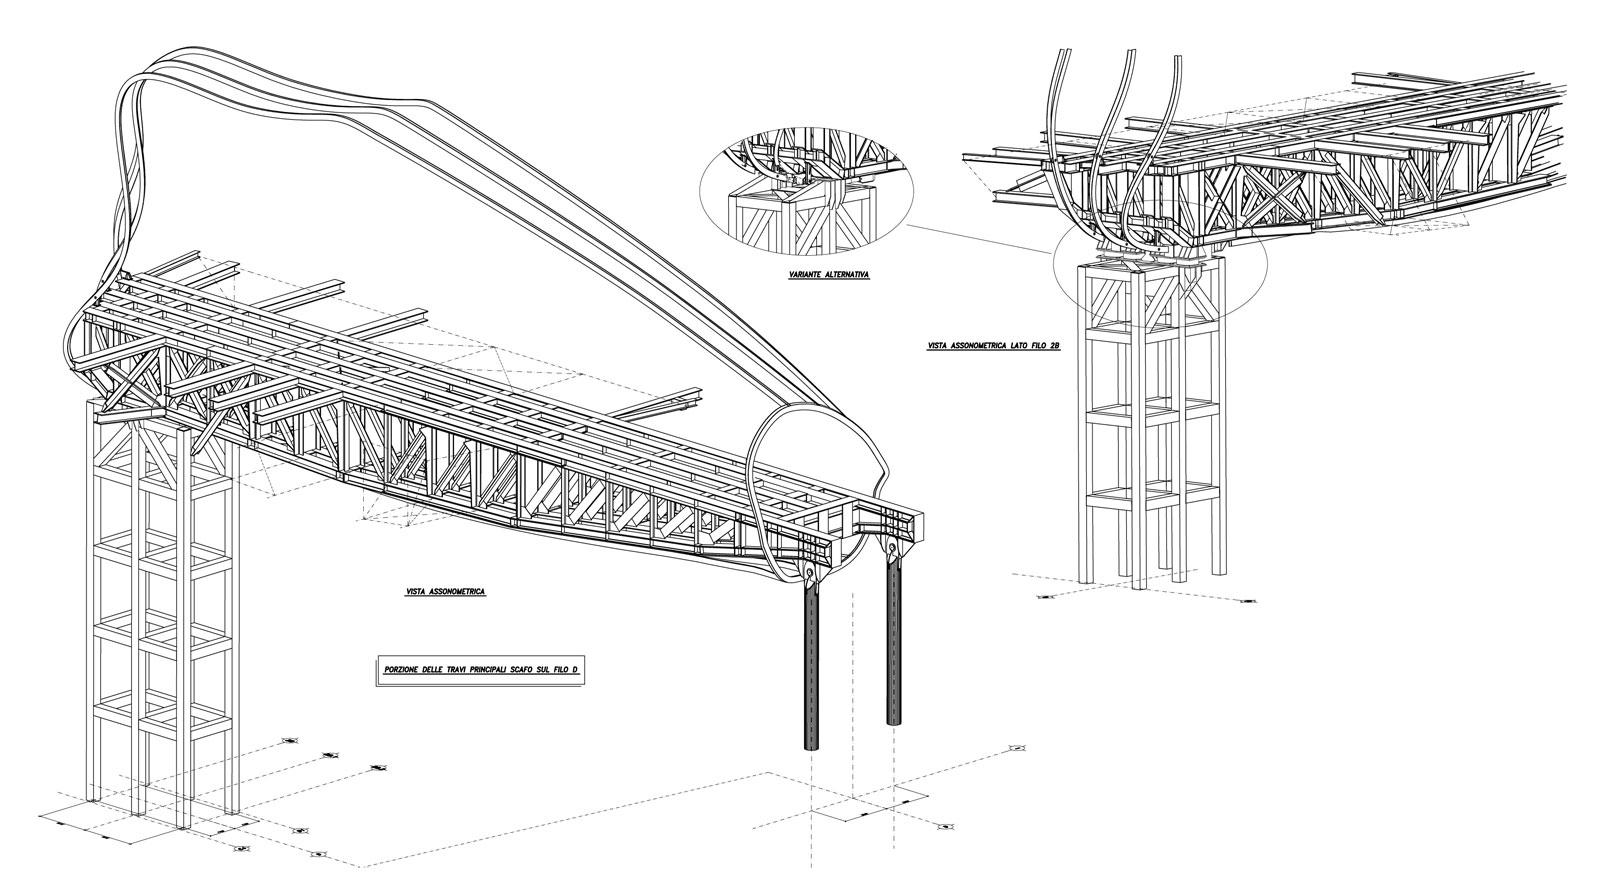 studio-fuksas_s778_det-sca_cloud-hull-structure-detail_02